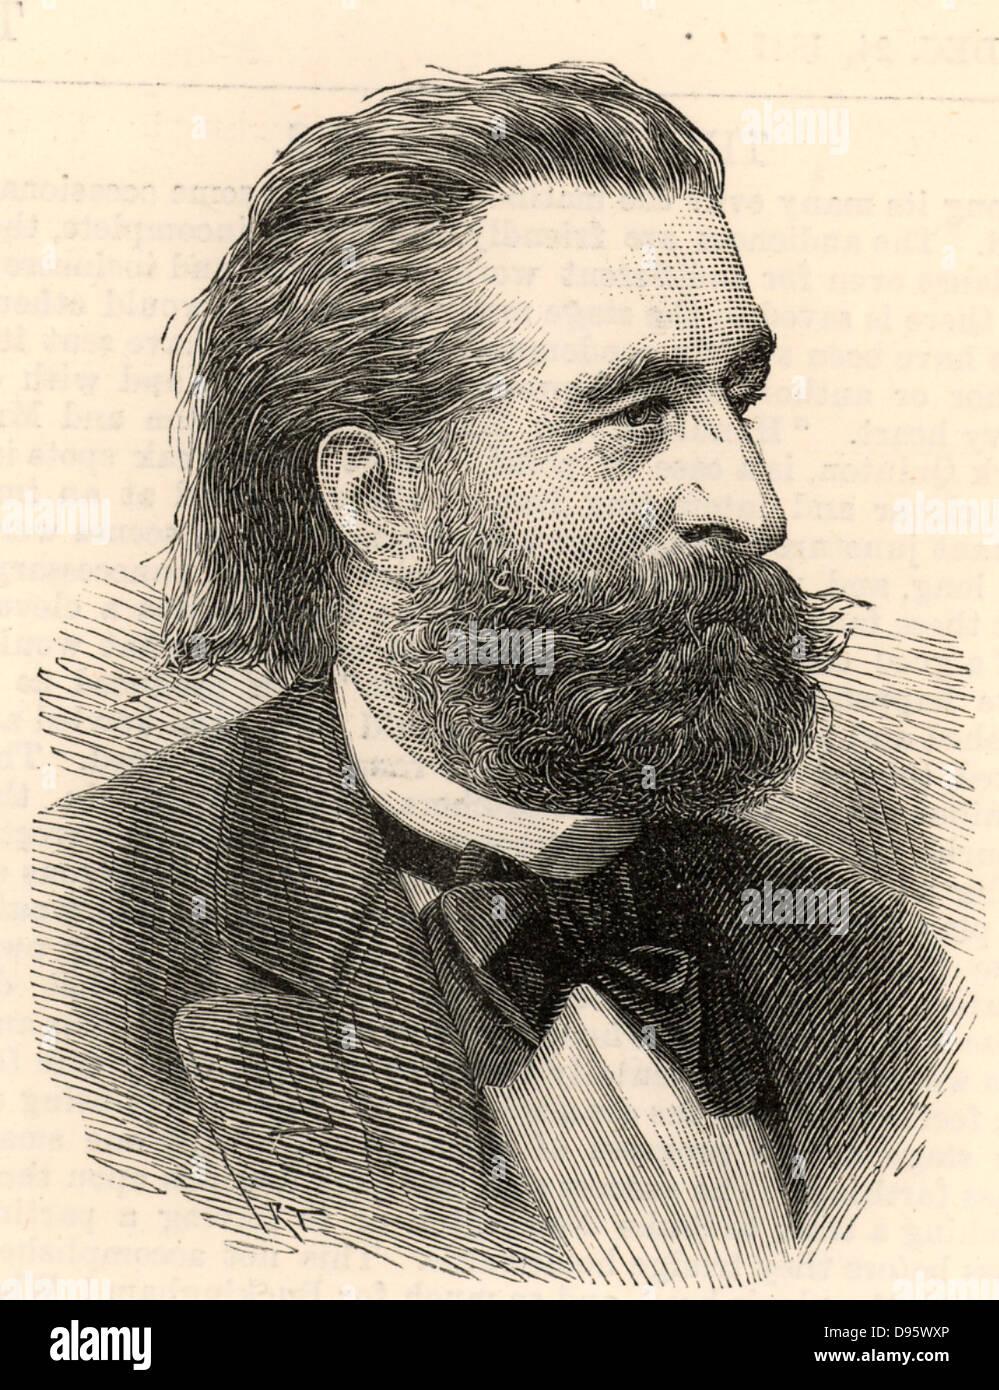 Ernst von Bergmann (1836-1907) German surgeon who introduced the sterilisation of surgical instruments.  He was - Stock Image